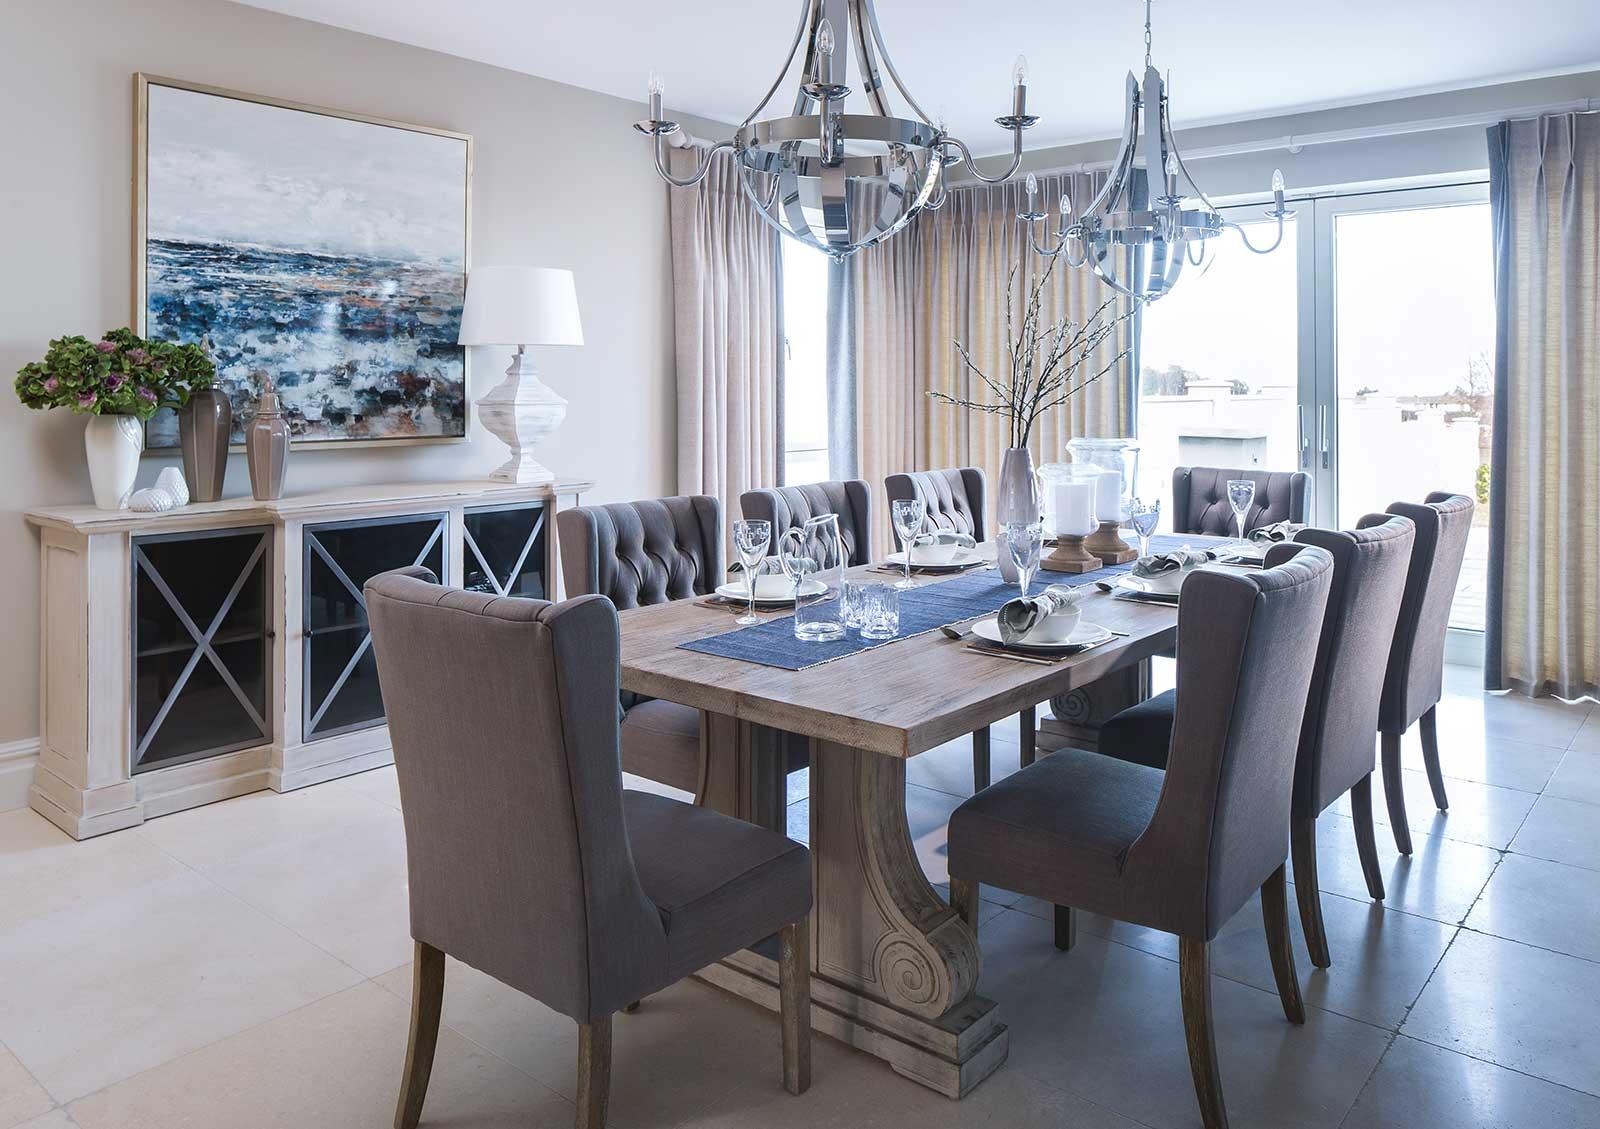 Carton-Interiors_P6_7_Dining-Room